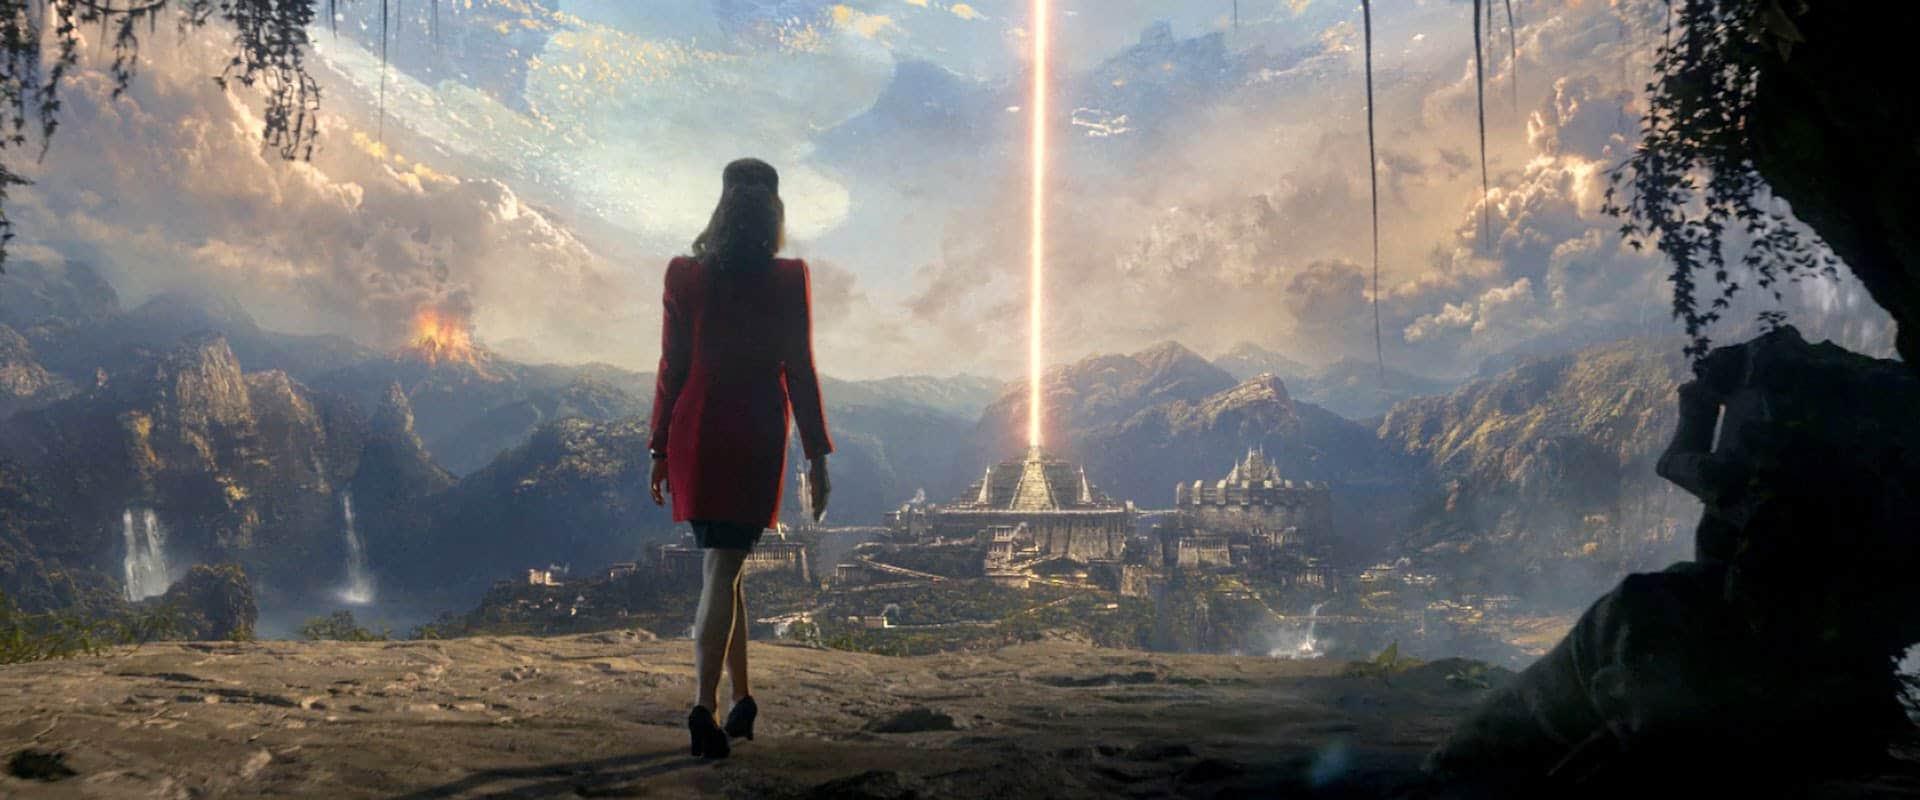 Agartha Hollow Earth Iron Sky Movie Scene